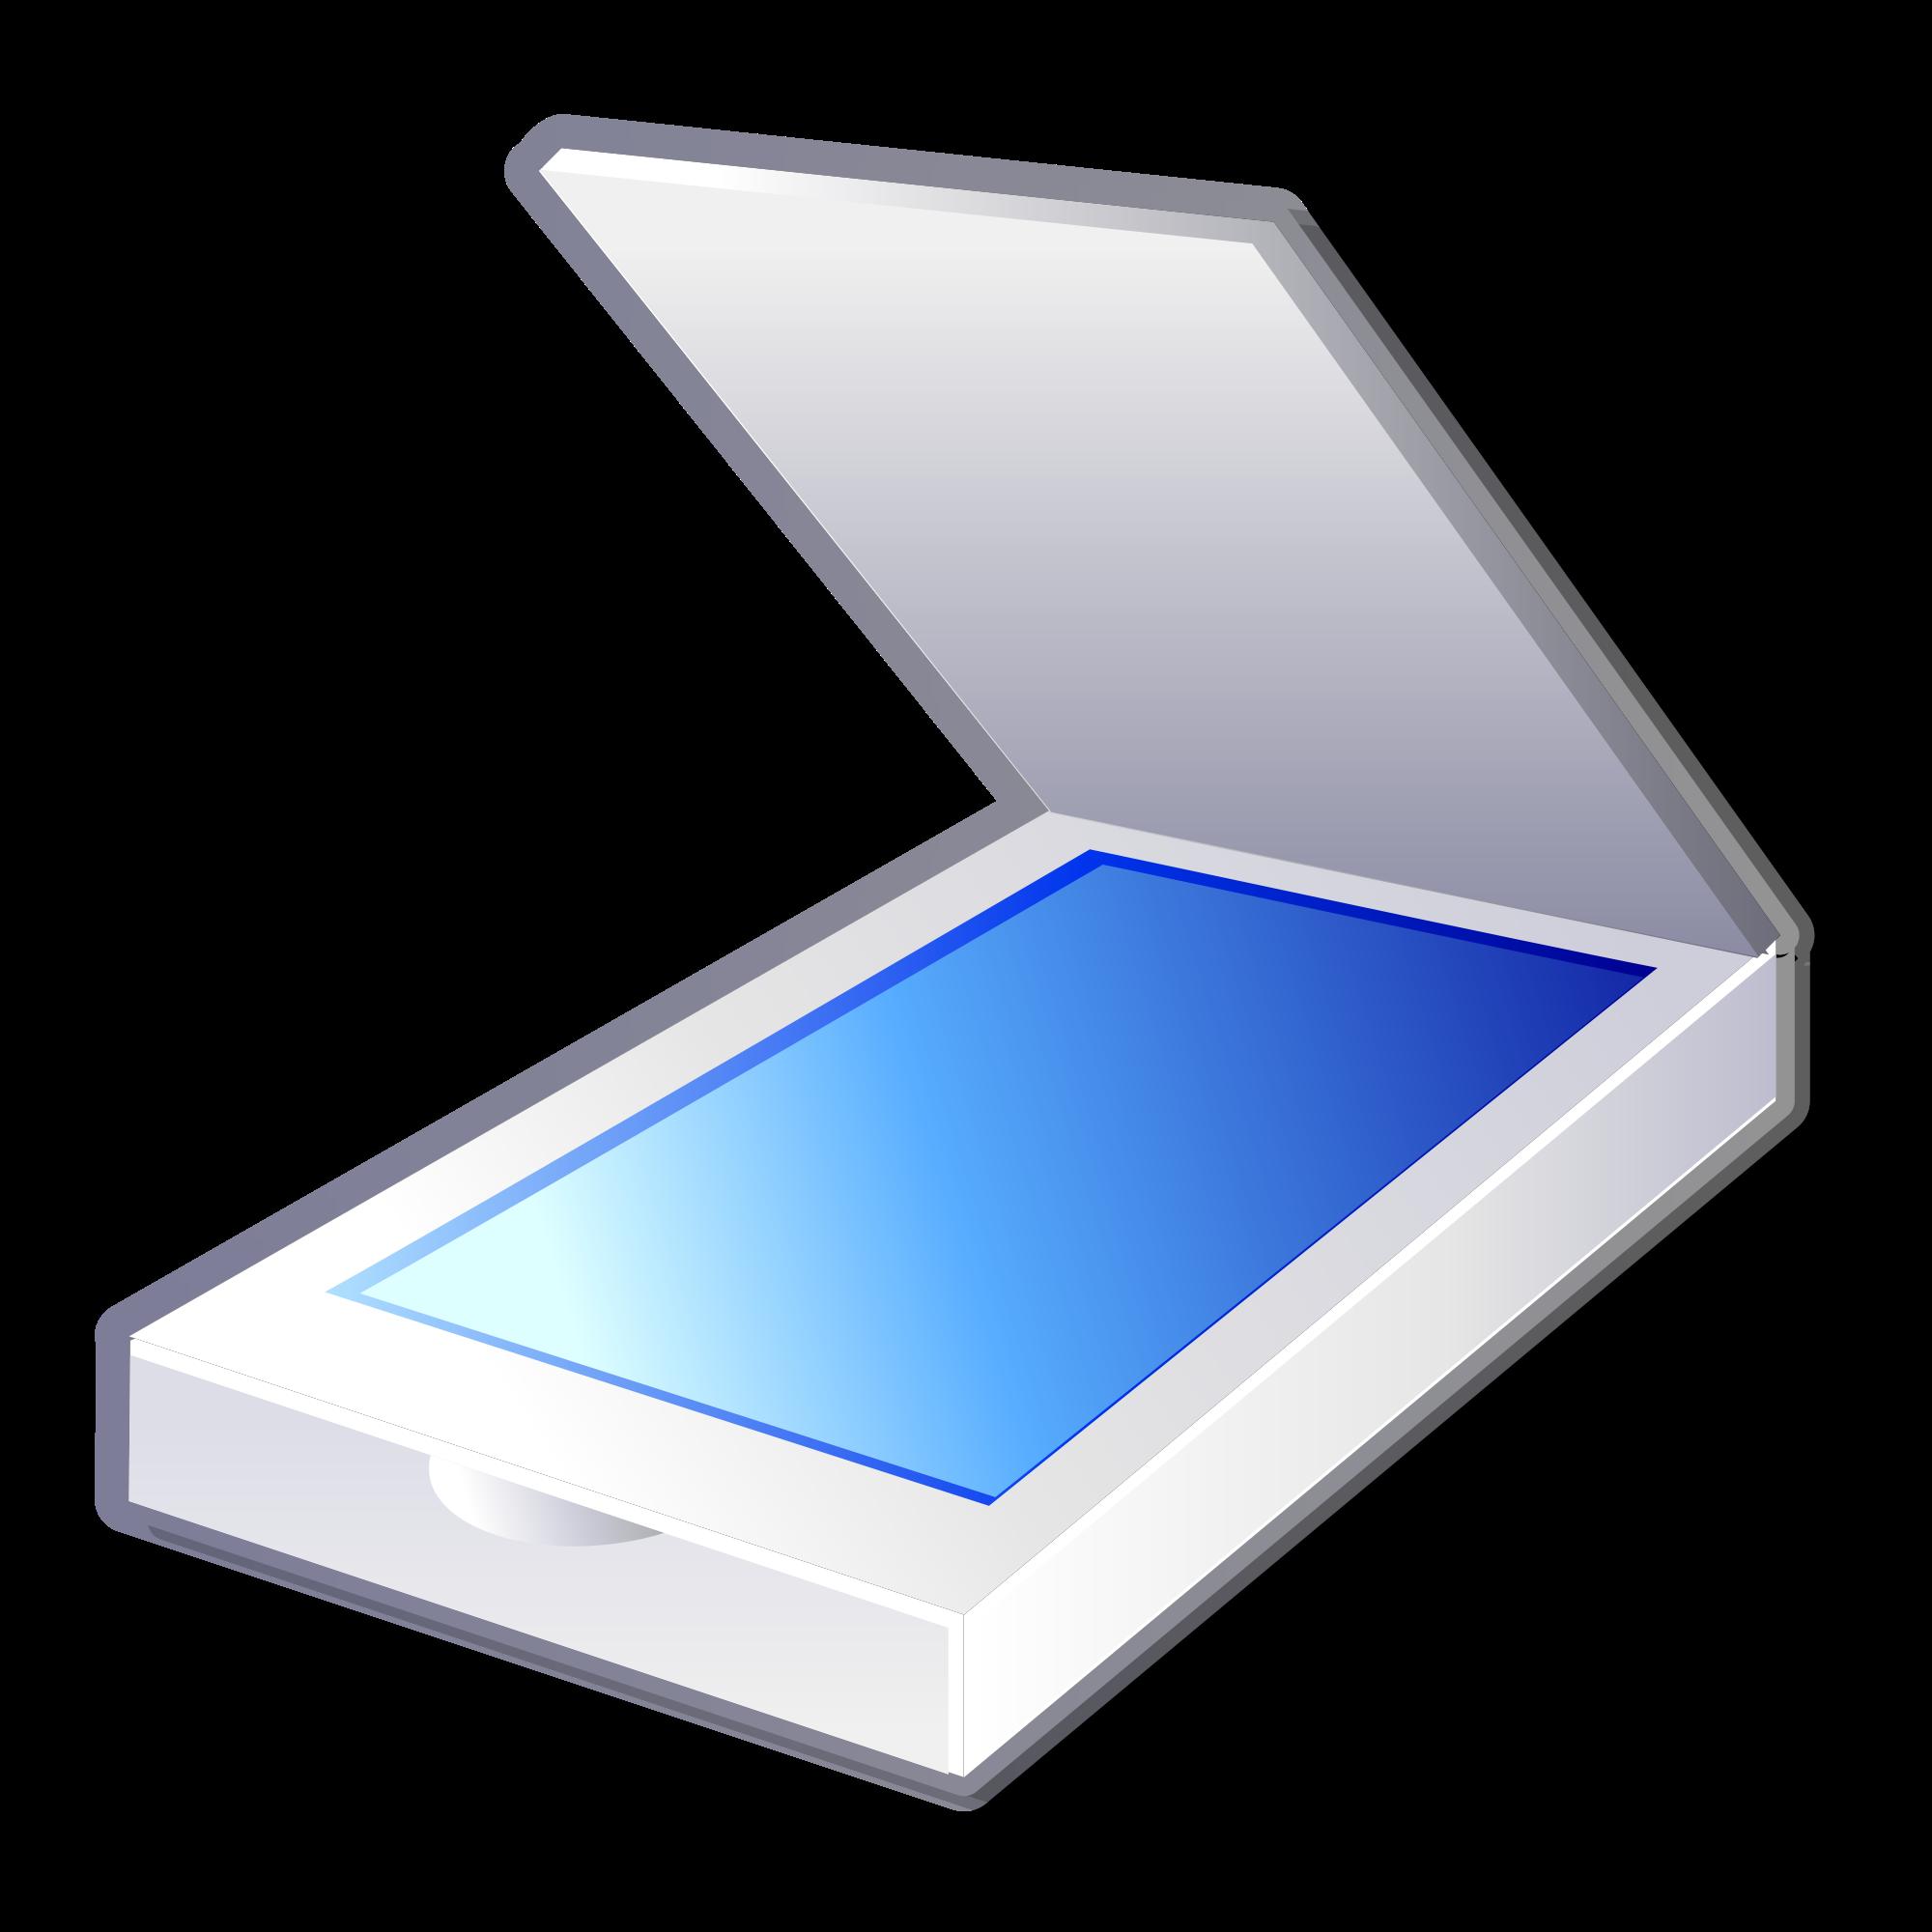 Open PlusPng.com  - Scanner HD PNG